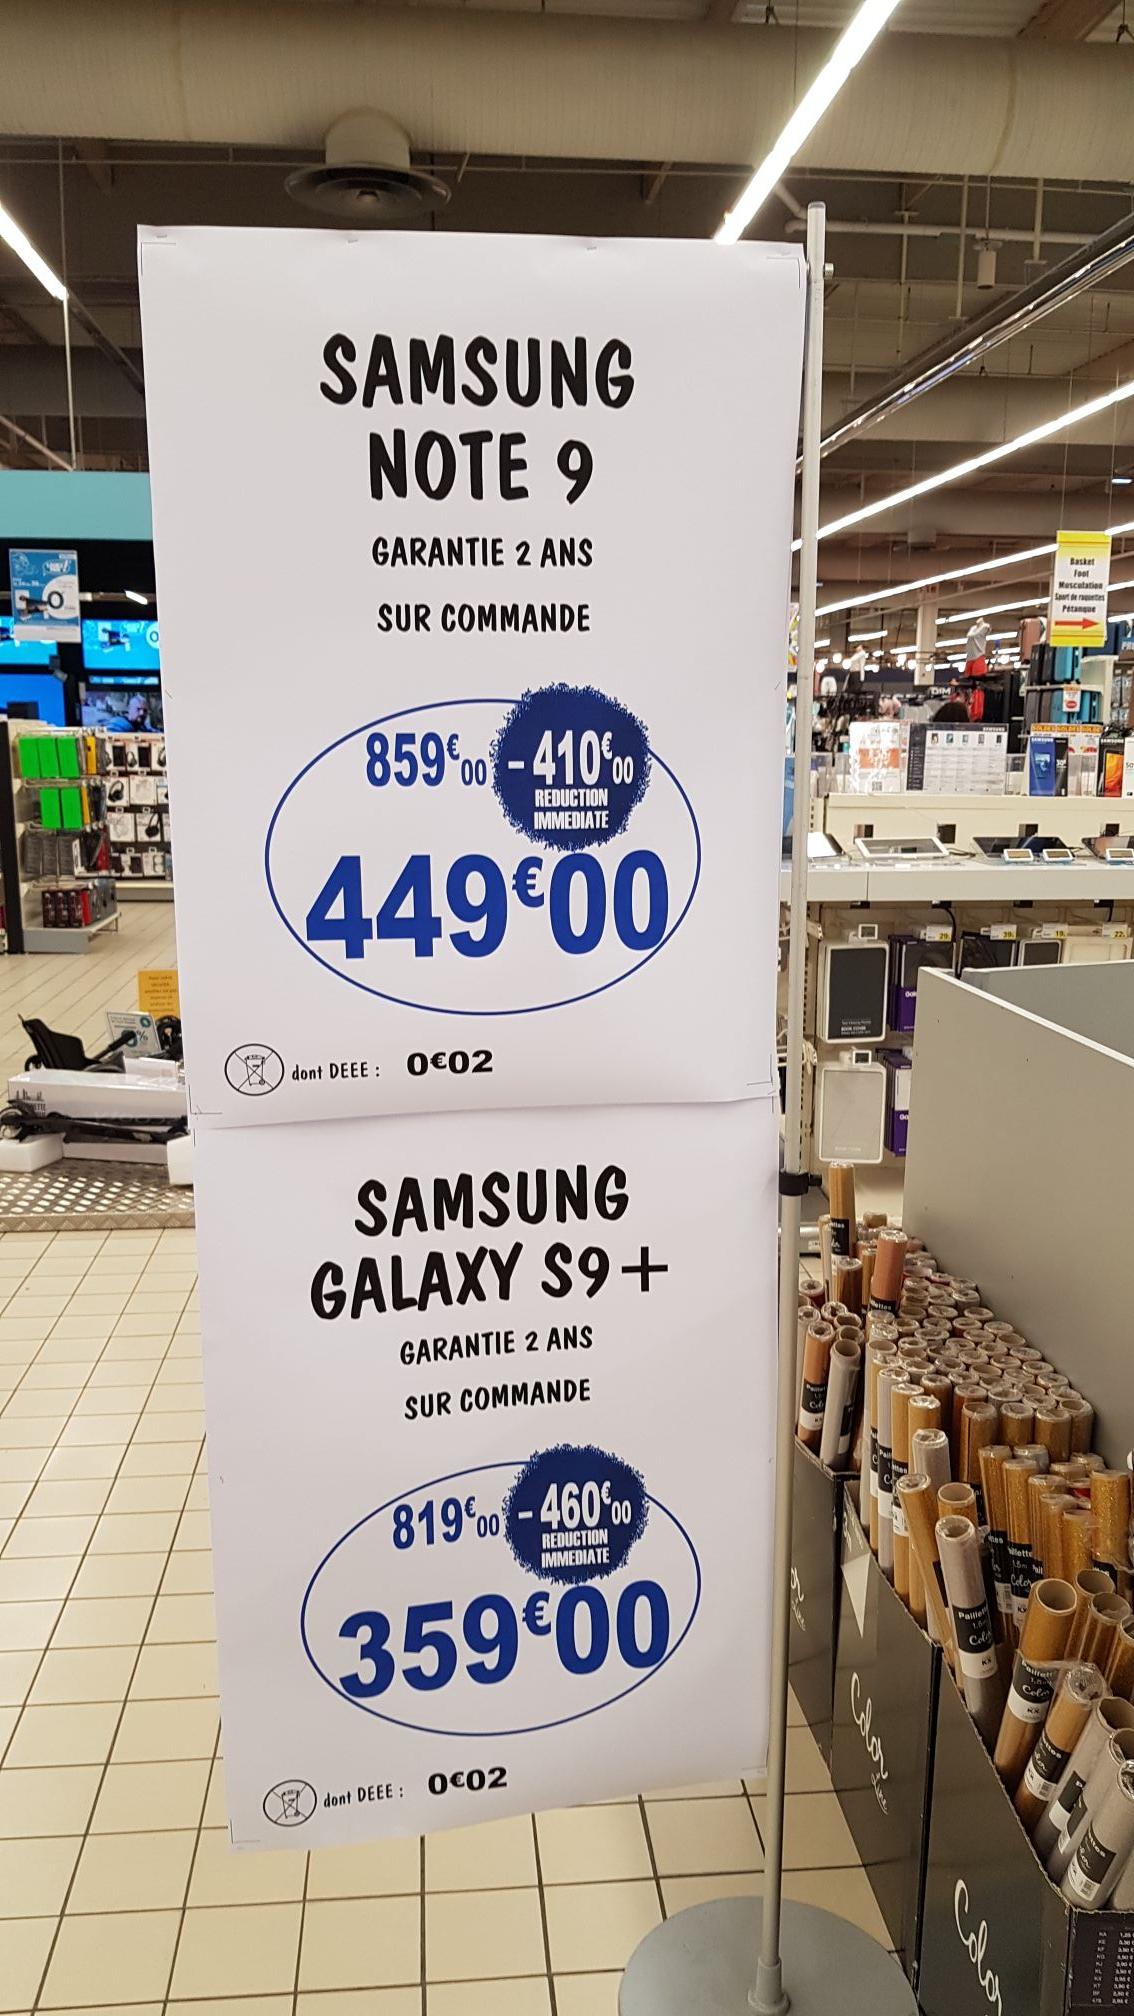 "Sélection de smartphones Samsung en promotion - Ex : 6.4"" Galaxy Note 9 (WQHD+, Exynos 9810, 6Go RAM, 128Go) - Saint-Orens-de-Gameville (31)"